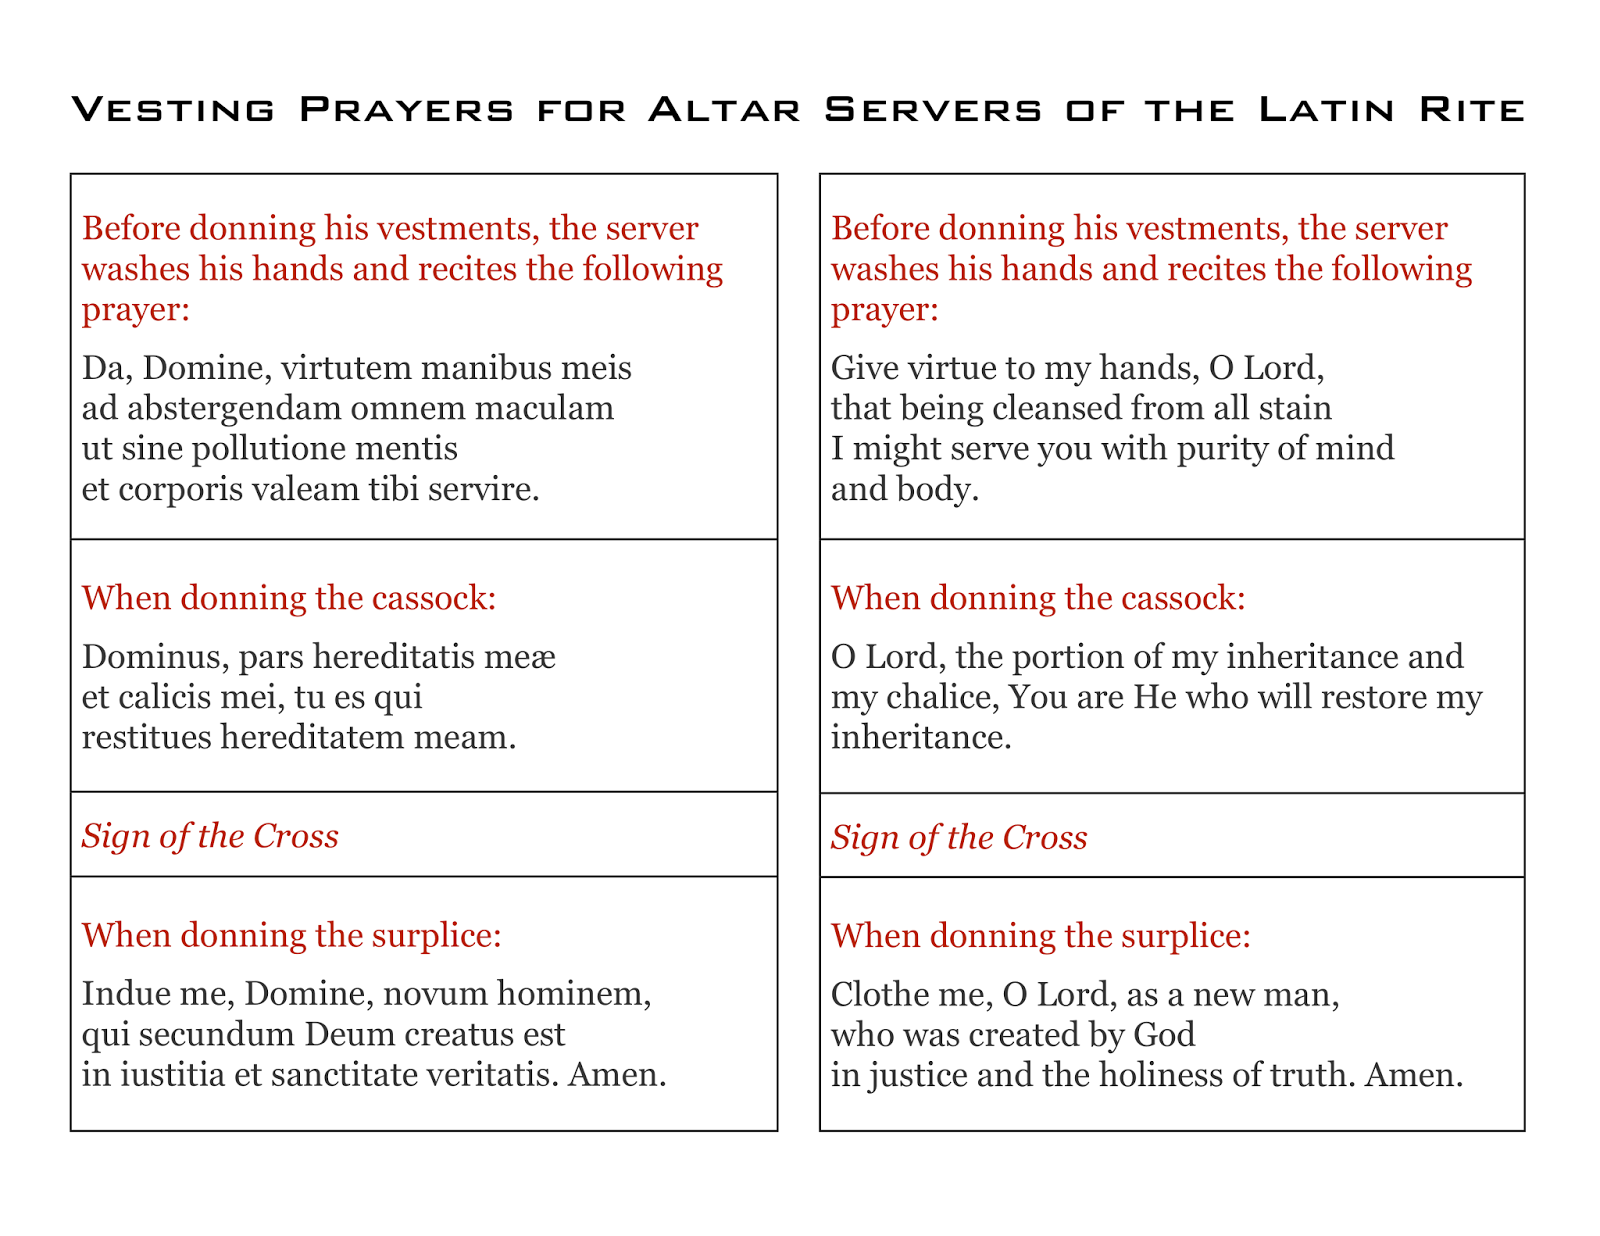 Altarservervestingprayersg 16001236 pixels catholic altarservervestingprayersg 16001236 pixels fandeluxe Image collections